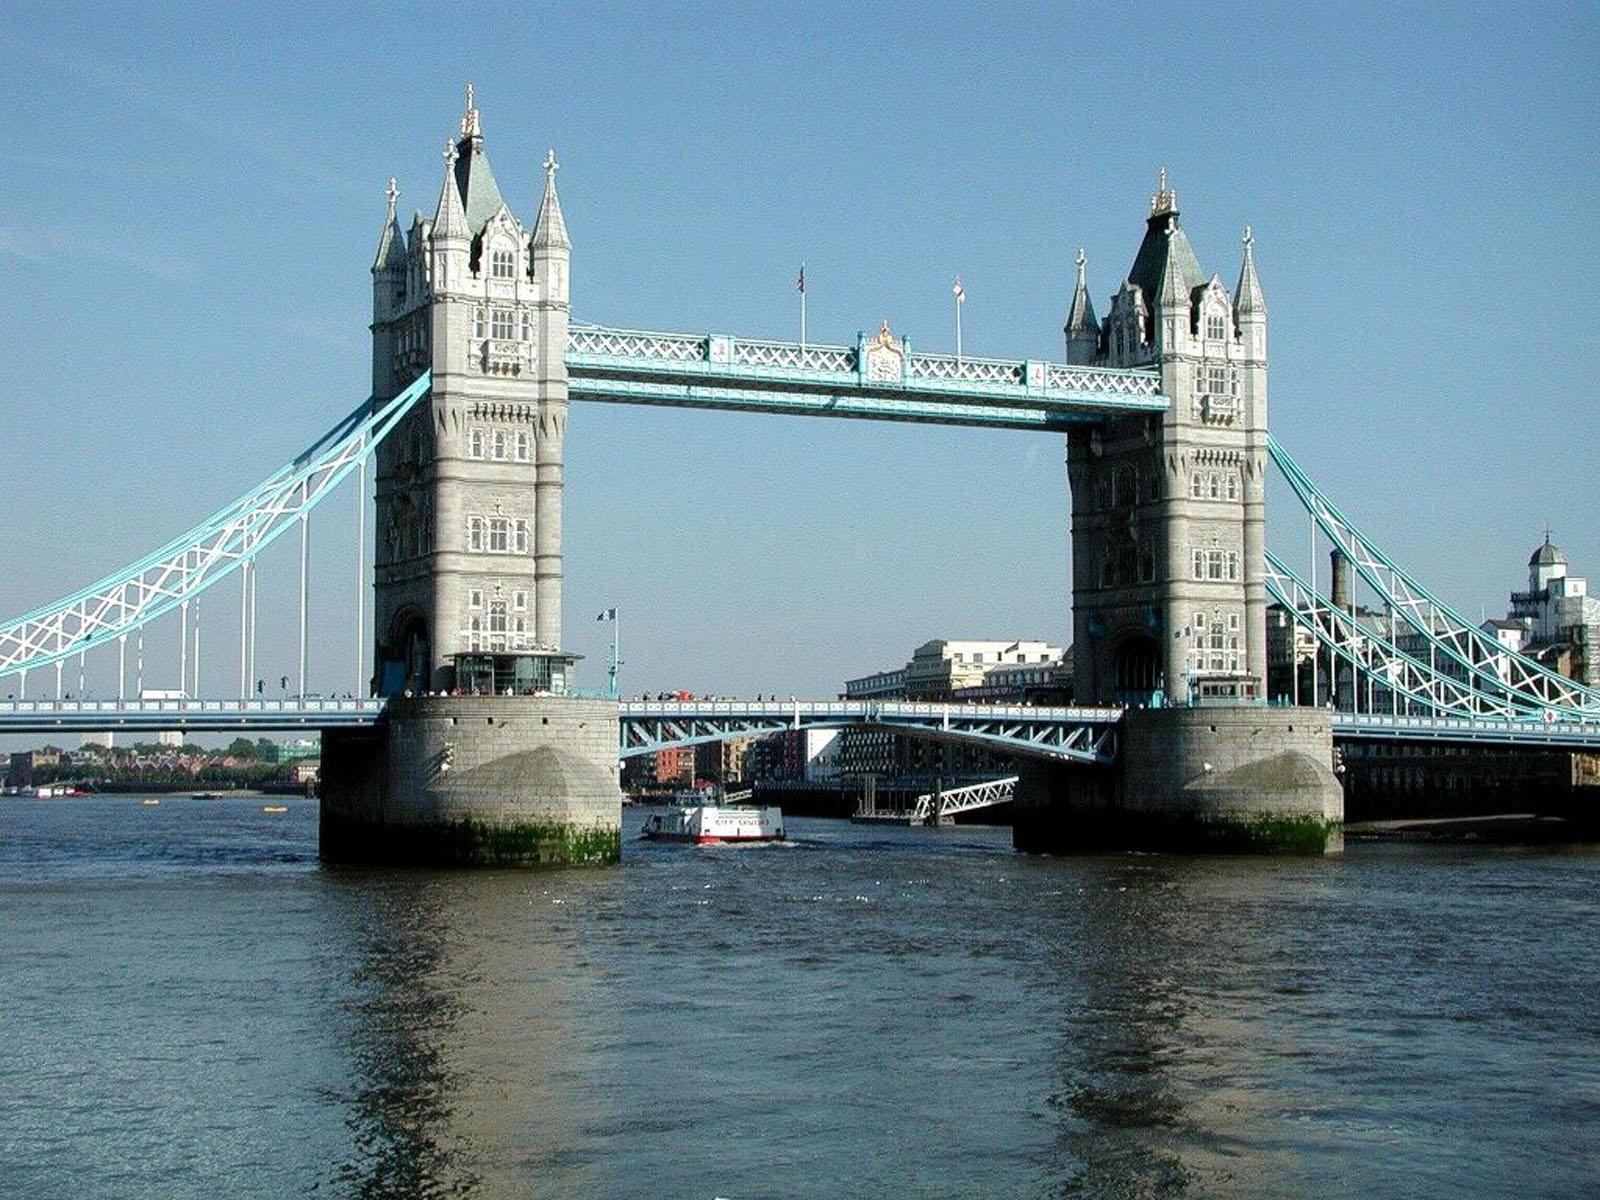 wallpapers Tower Bridge London Wallpapers 1600x1200